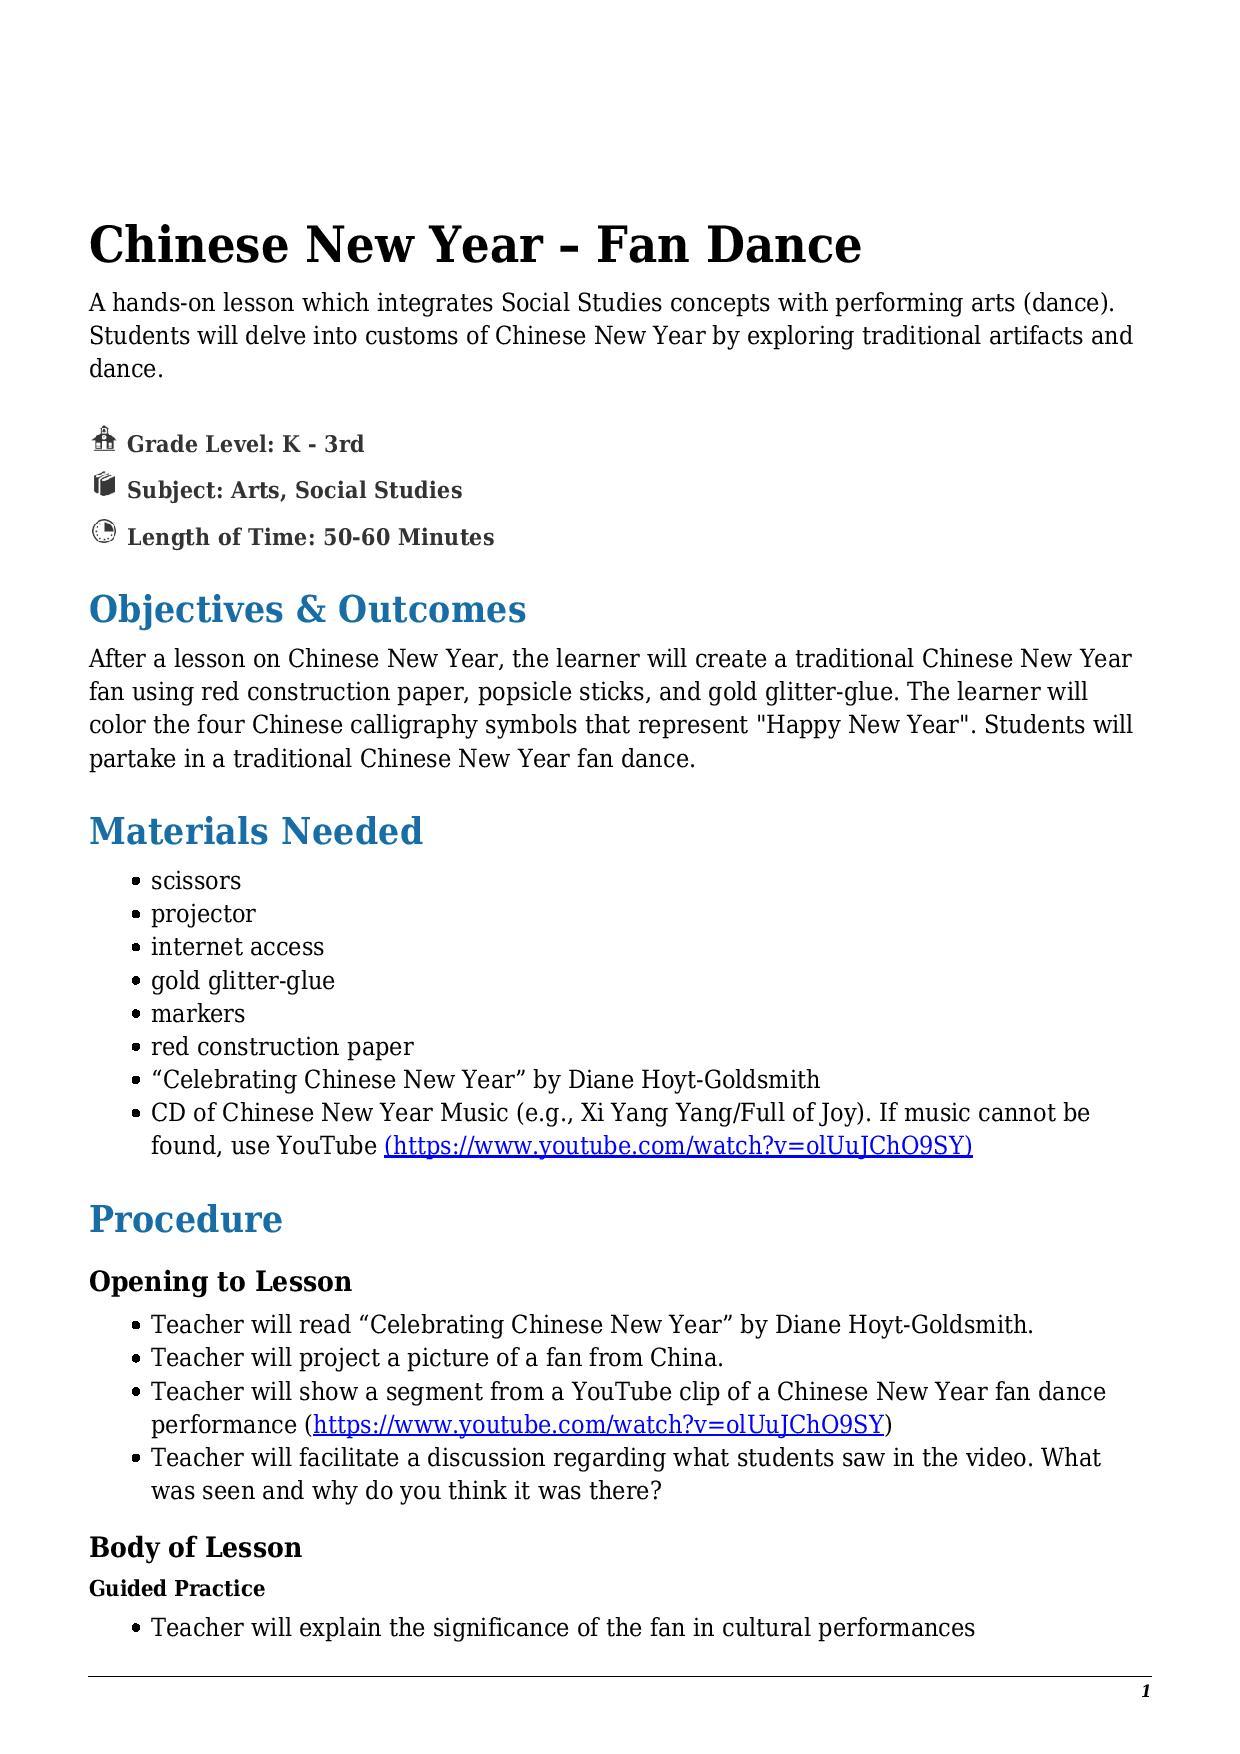 hight resolution of Chinese New Year – Fan Dance Kindergarten - 3rd Grade - Lesson Tutor